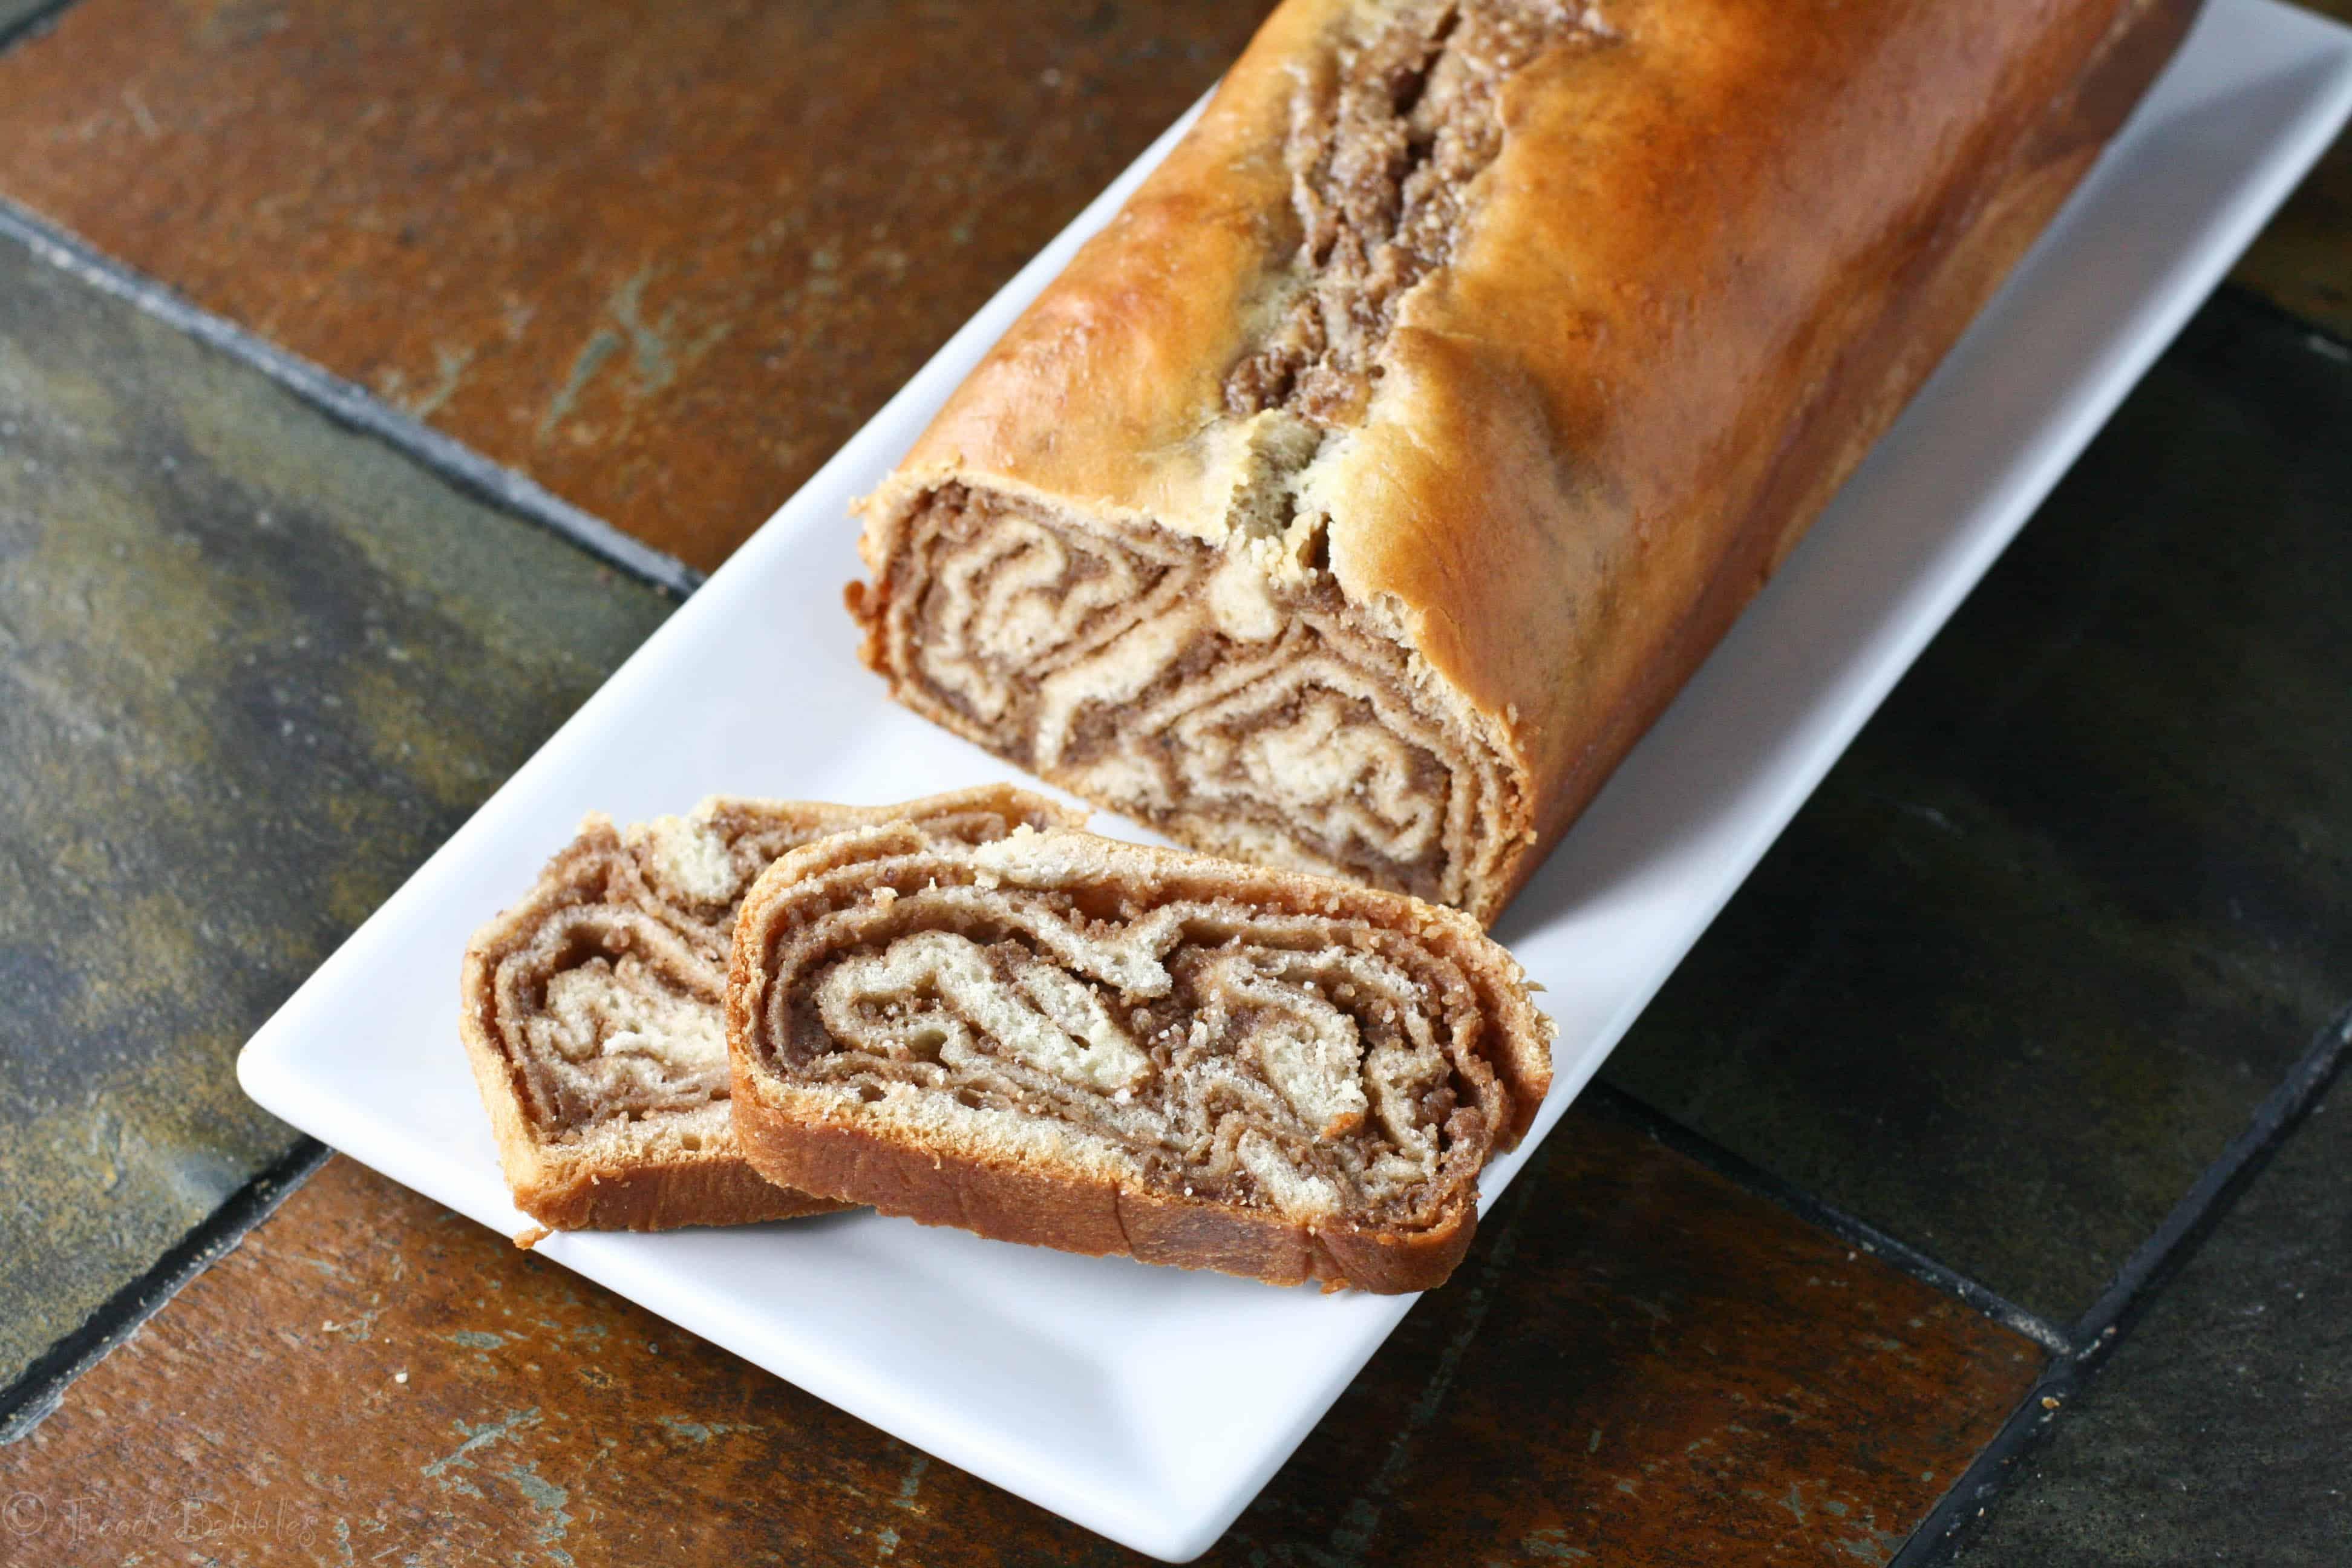 Walnut cinnamon swirl bread